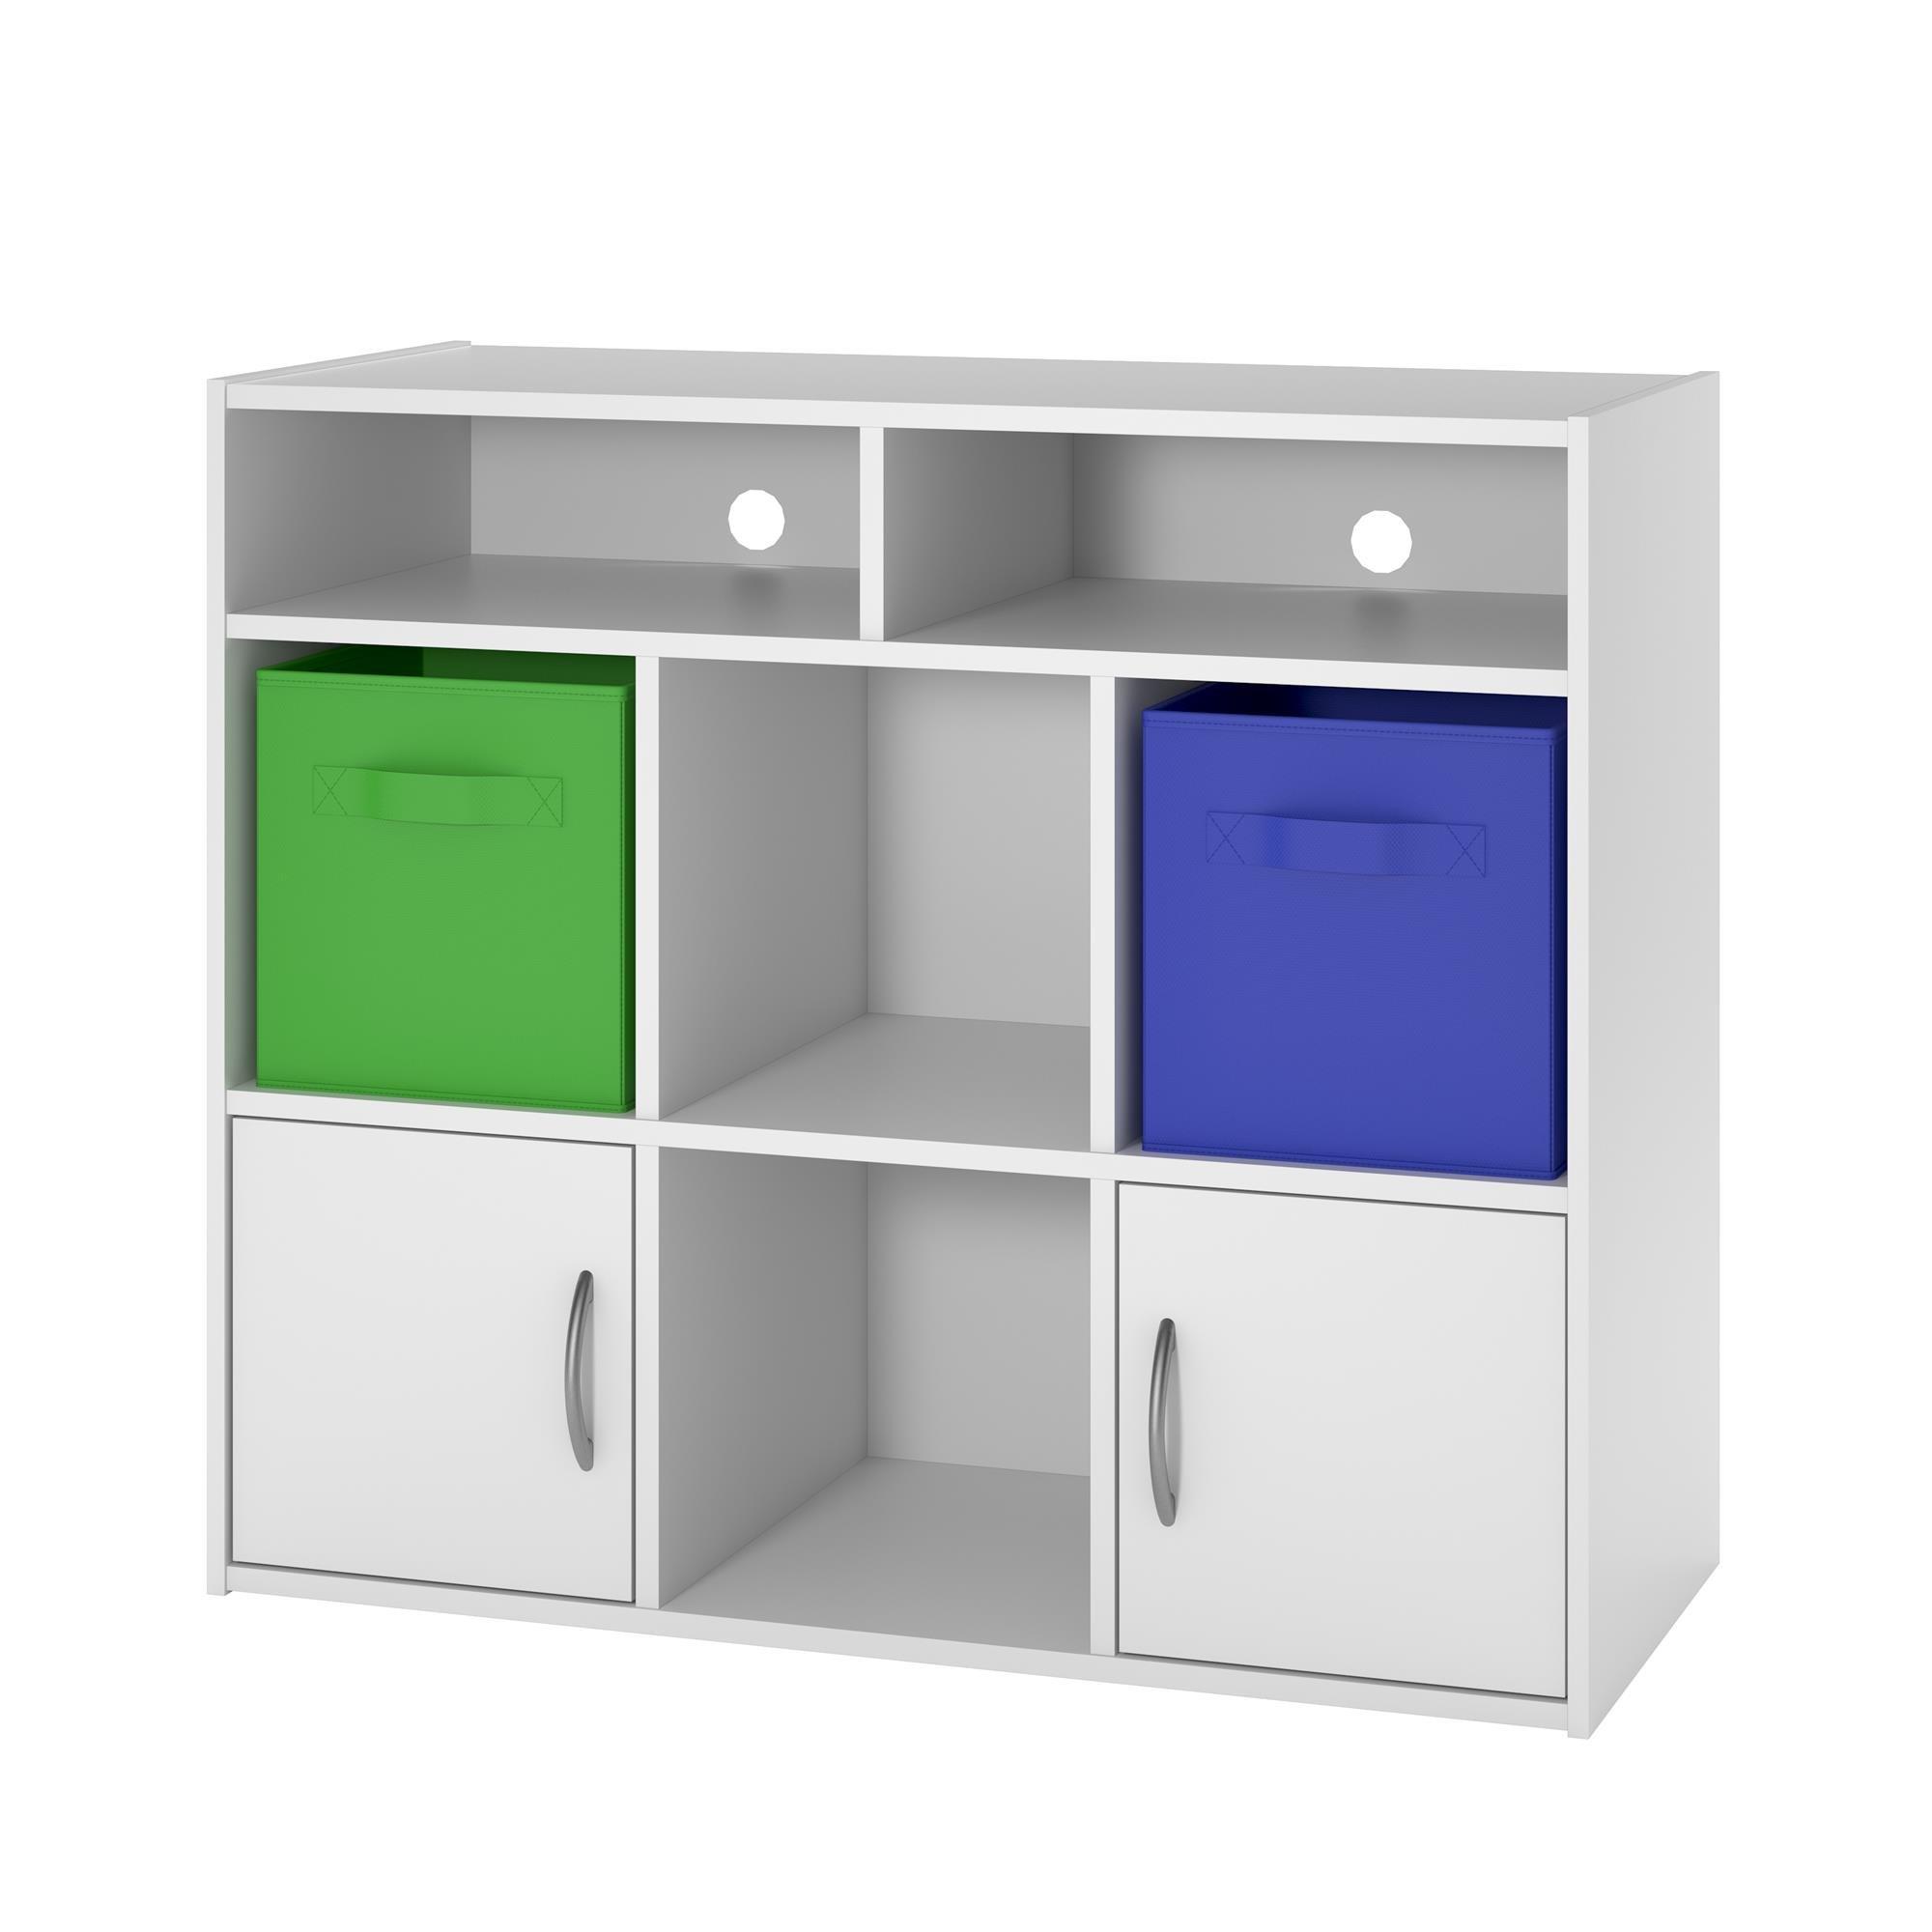 Cosco Lucerne Media Dresser with Fabric Bins, White